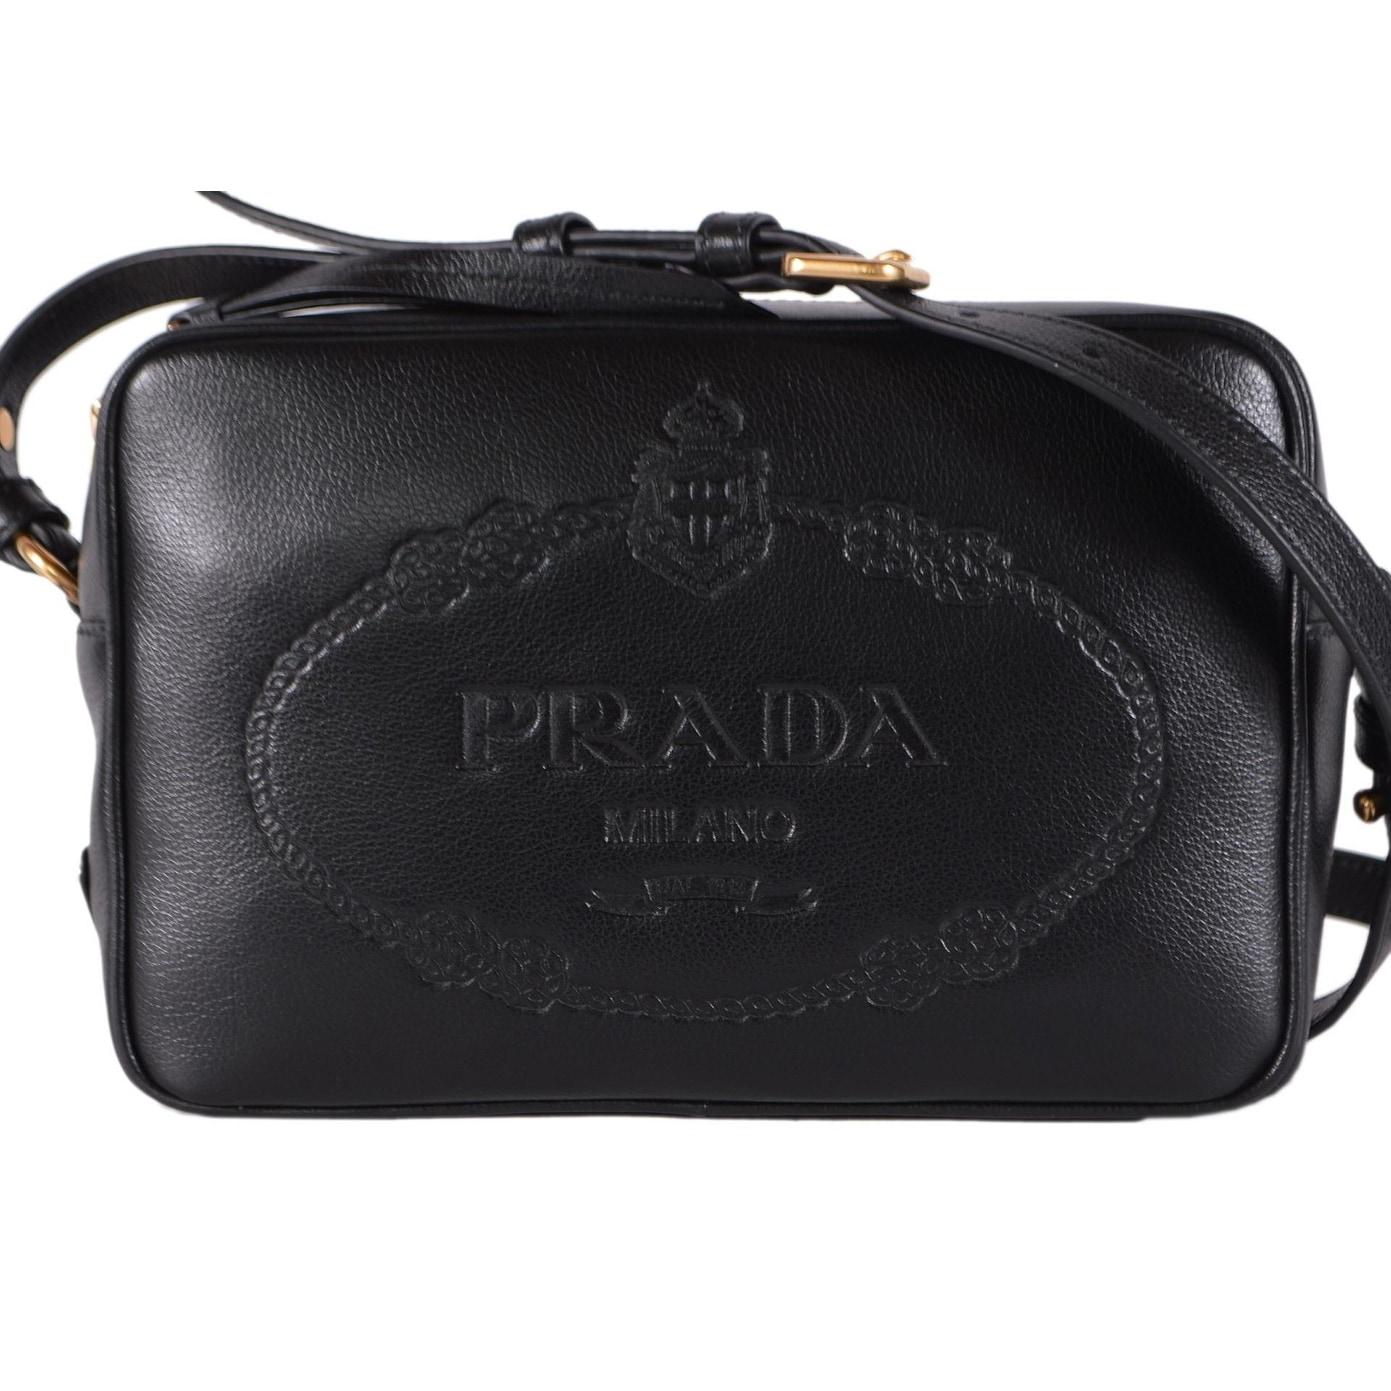 Prada 1bh089 Black Glace Leather